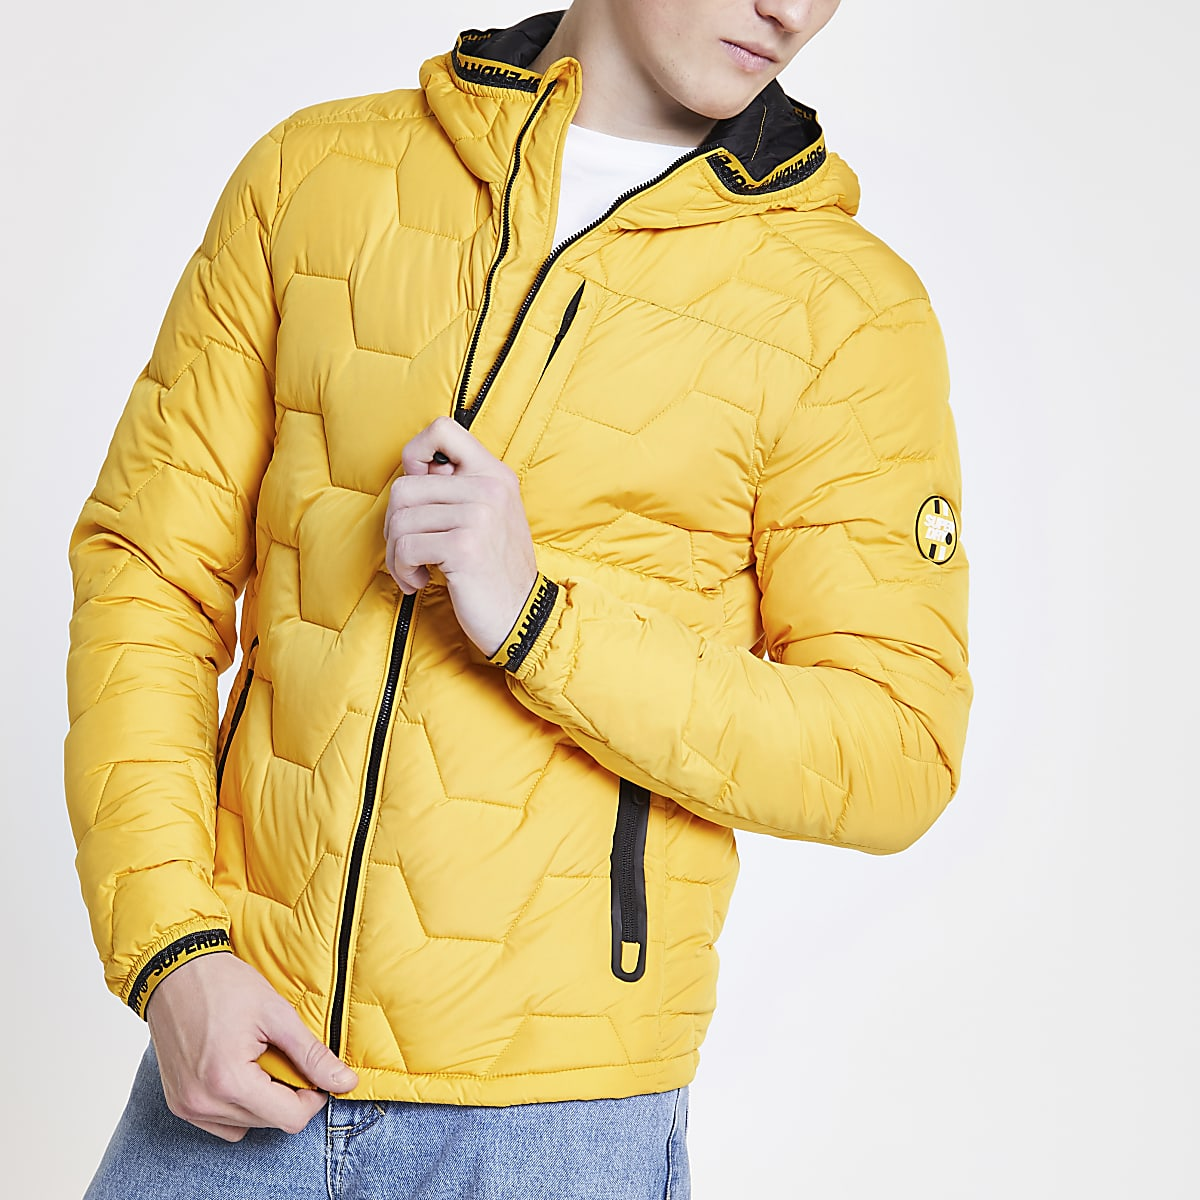 Superdry – Doudoune jaune matelassée